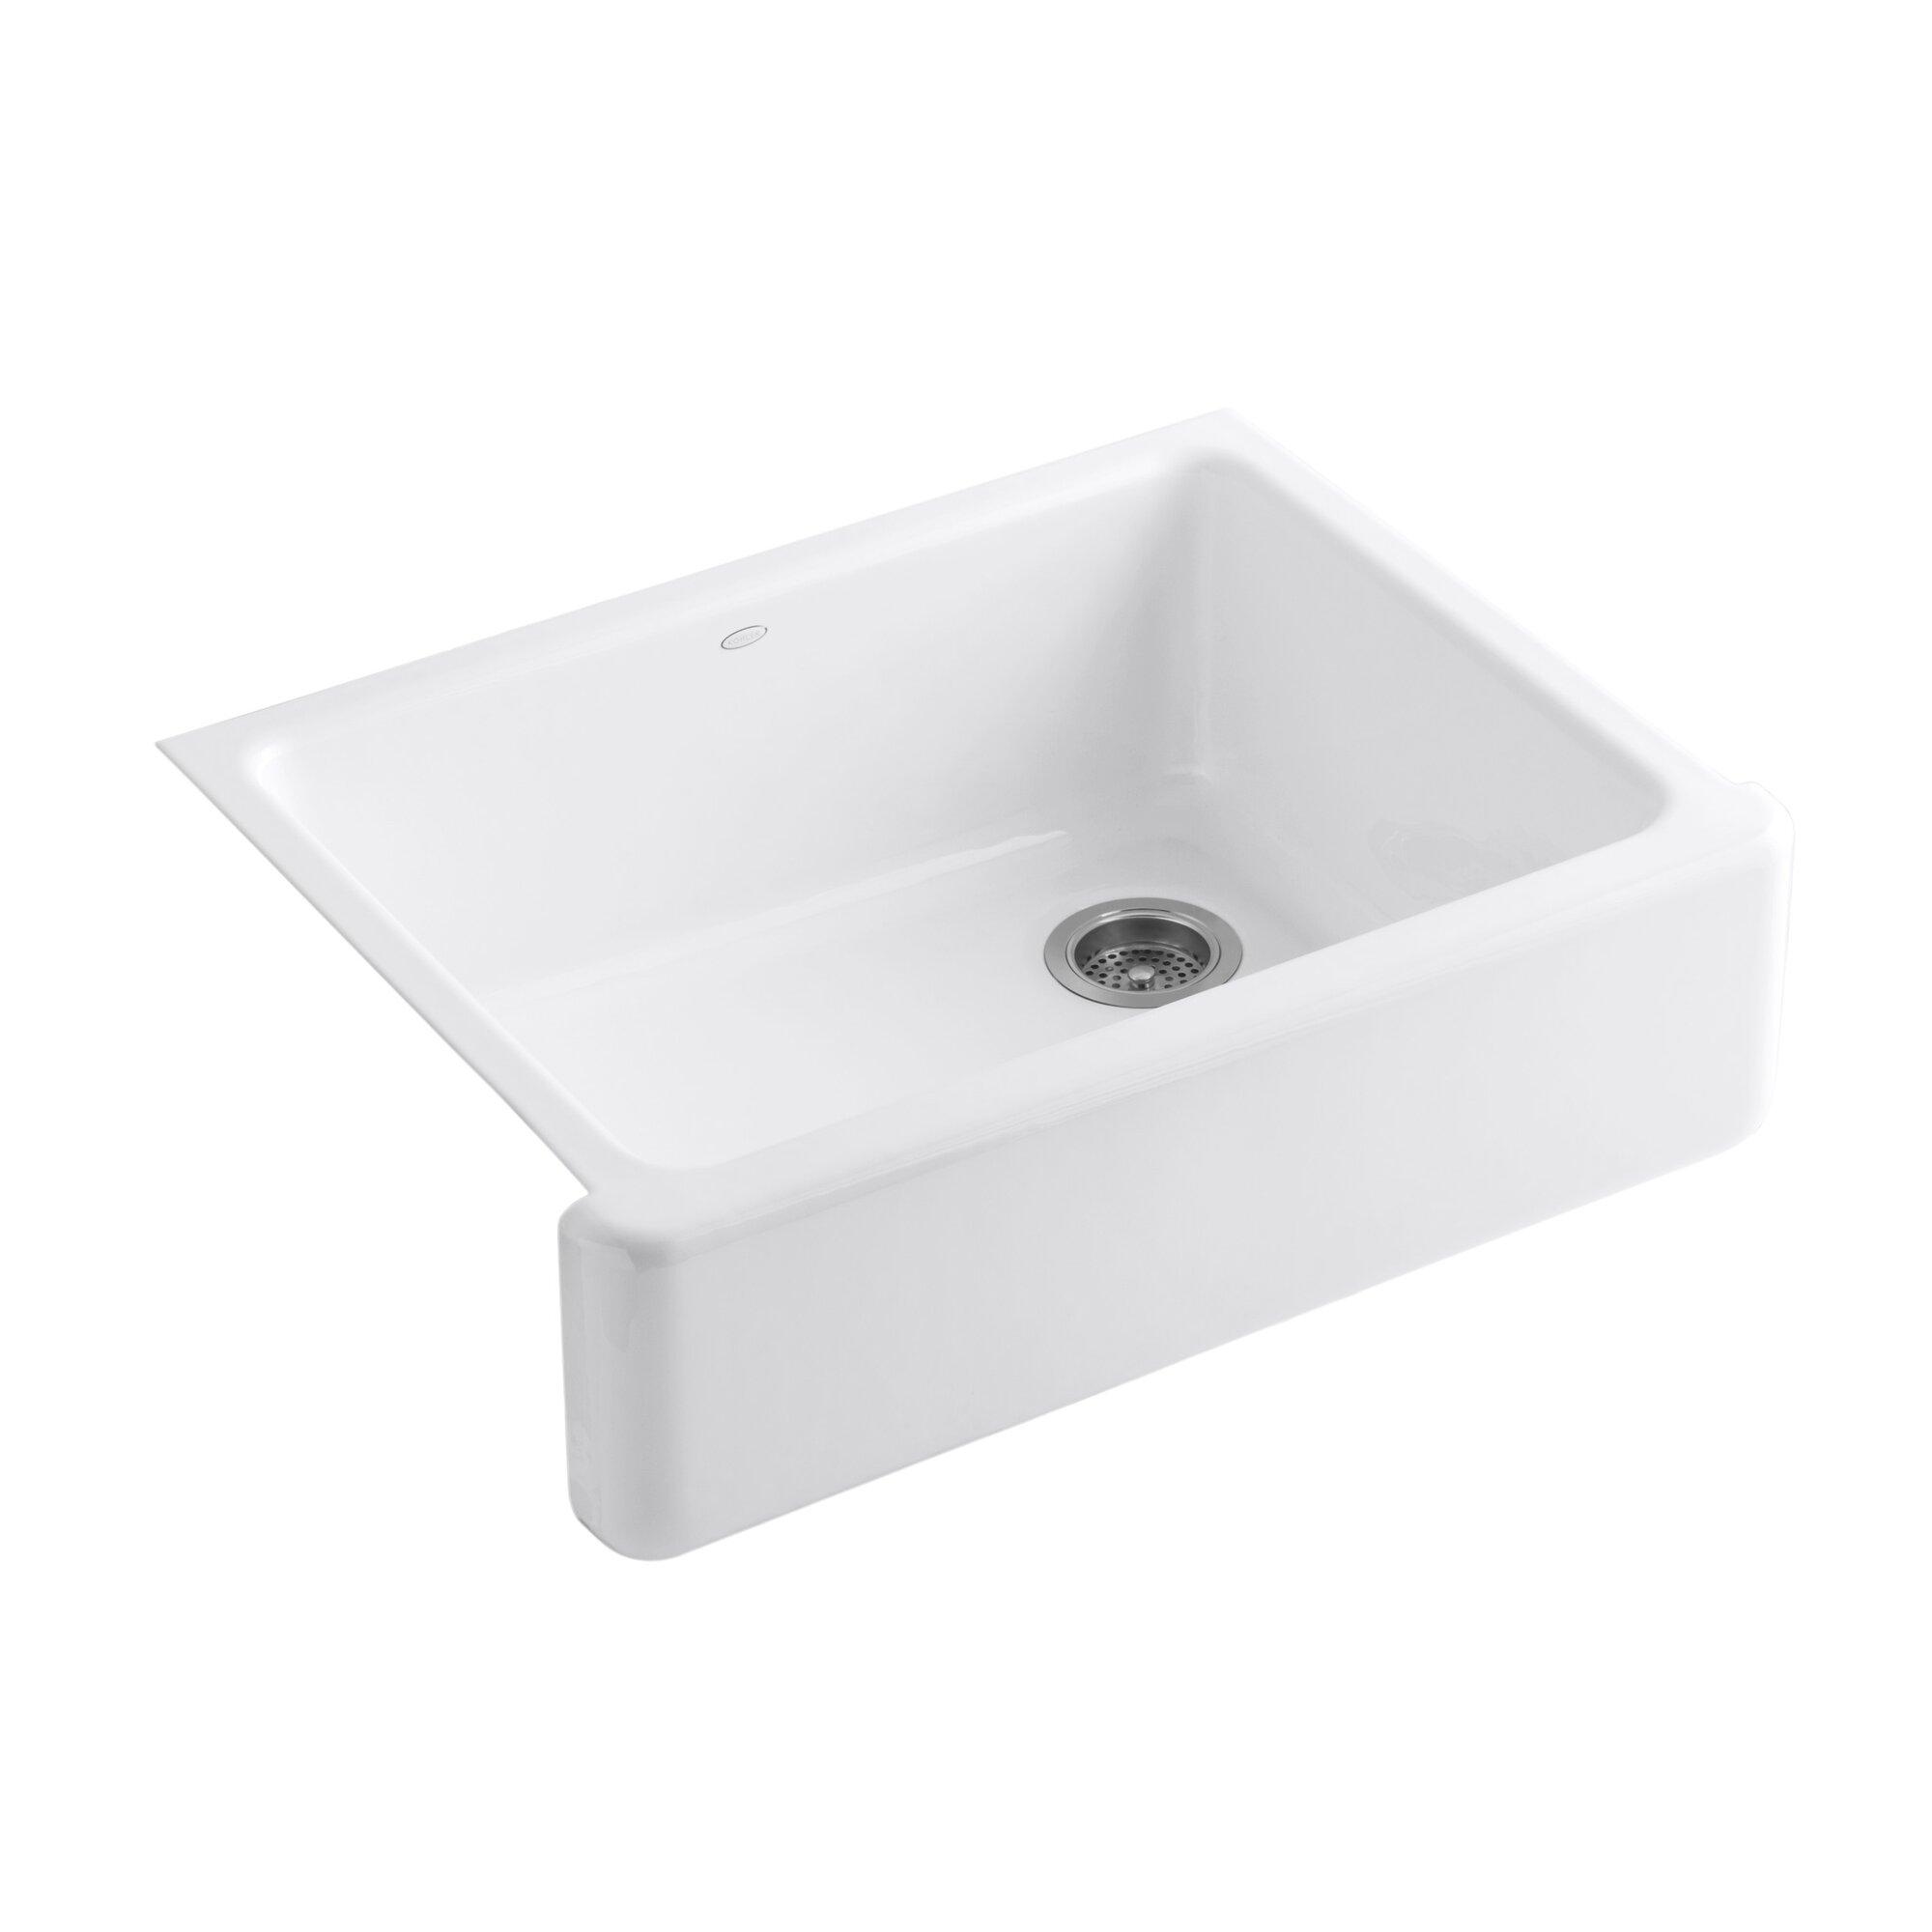 "Kohler Whitehaven 29 69"" x 21 69"" Farmhouse Single Bowl Kitchen Sink & Reviews"